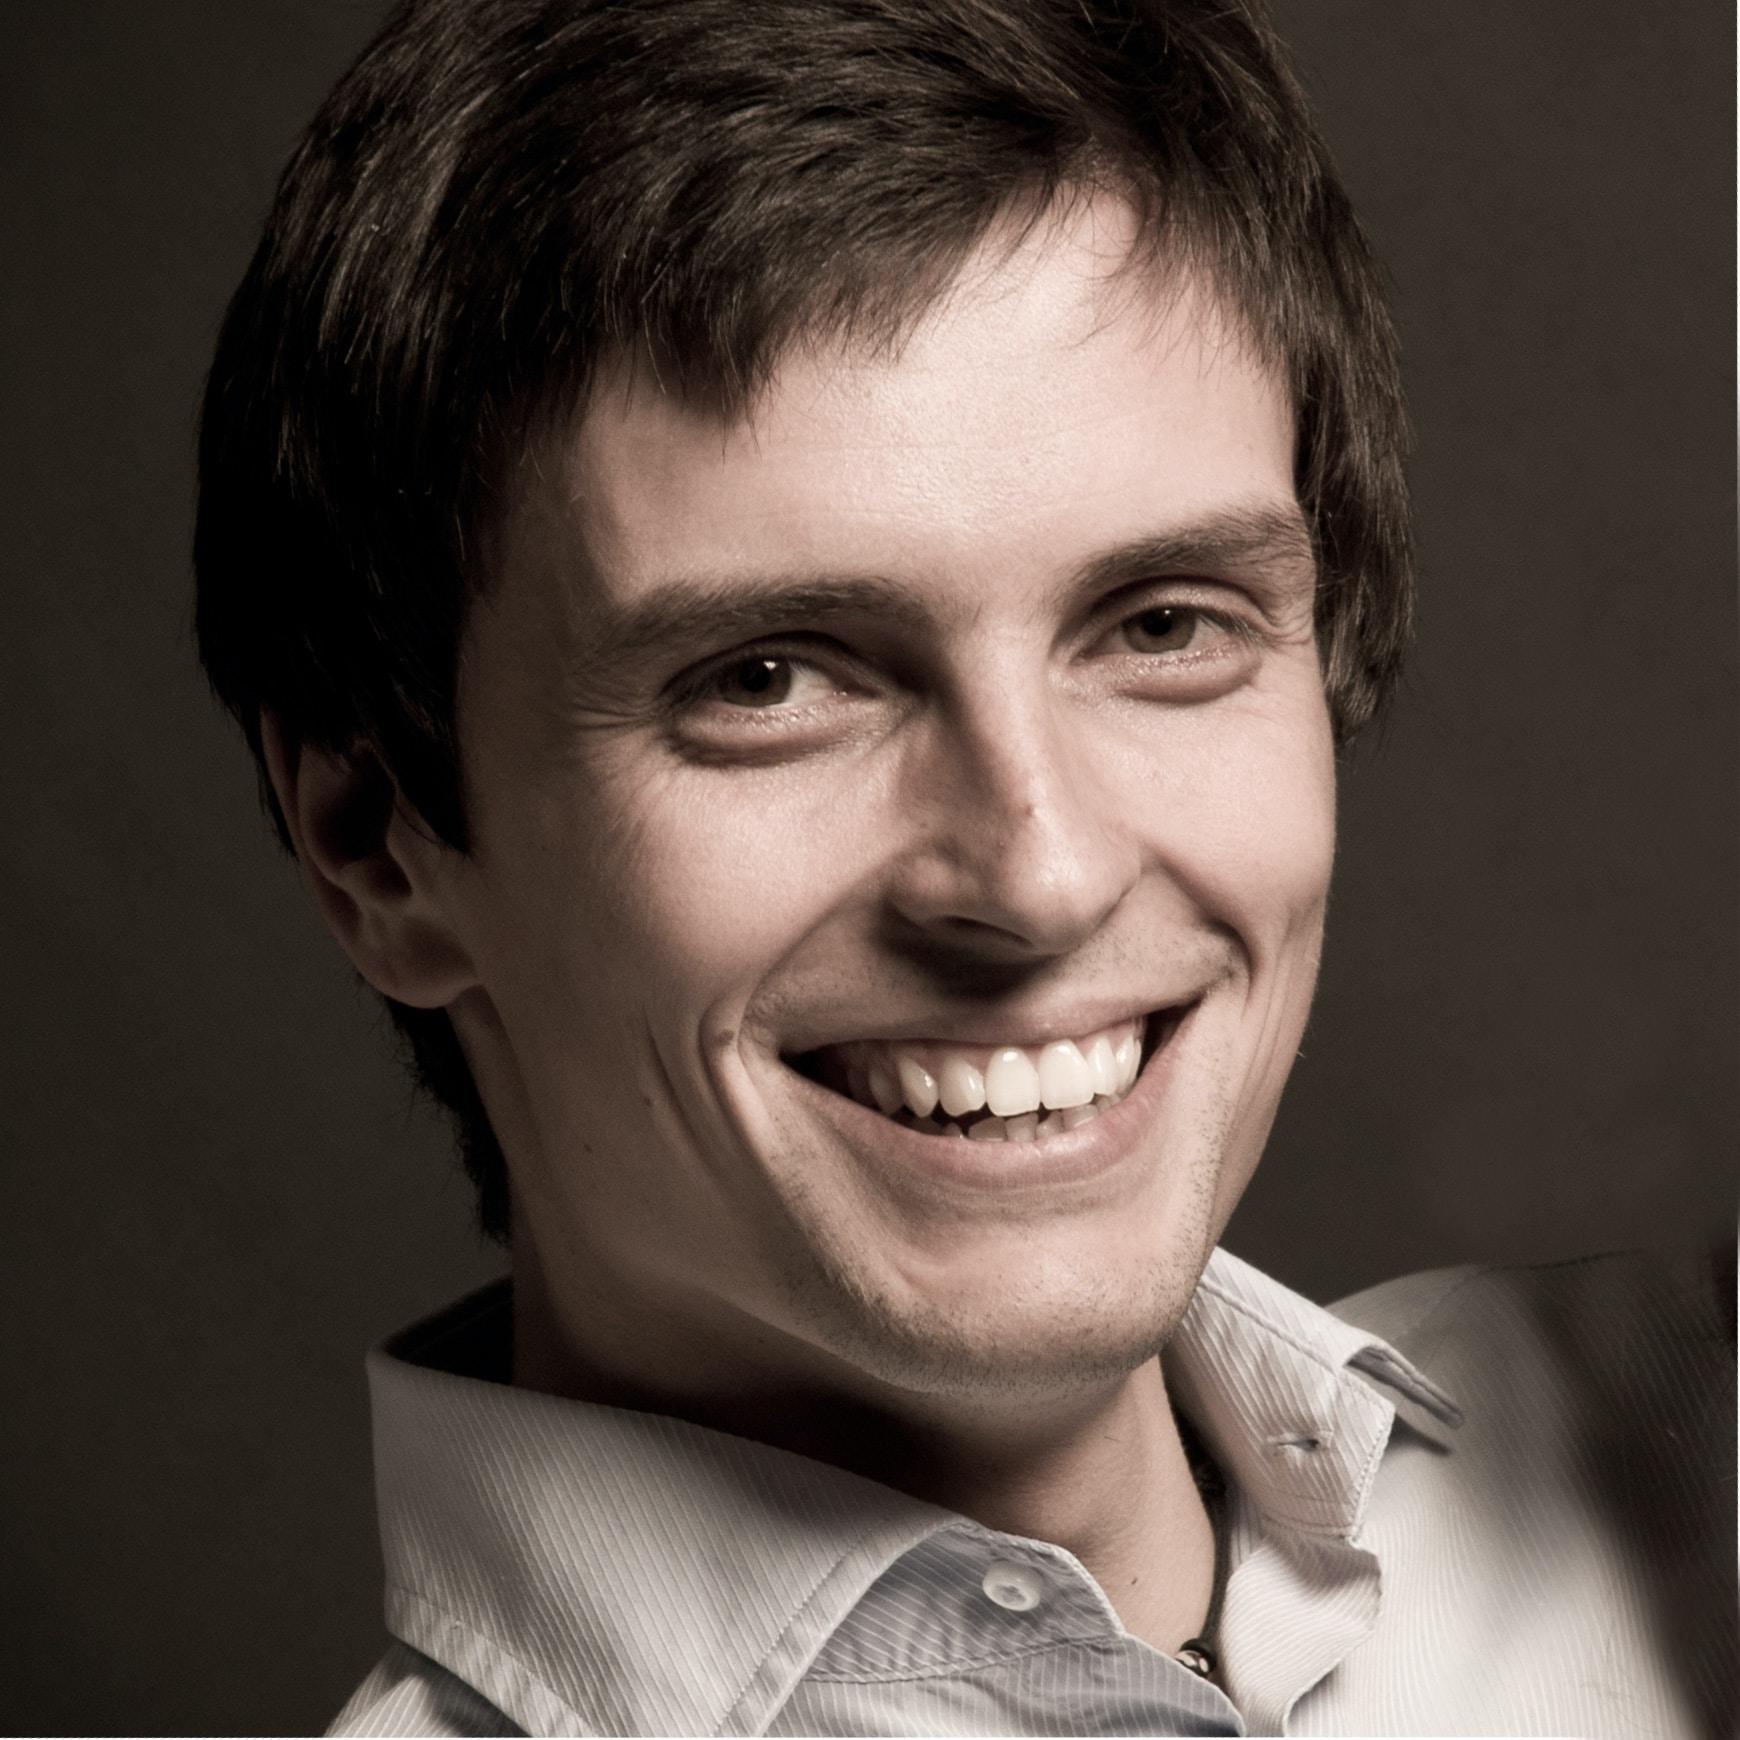 Go to Jakub Puchalski's profile